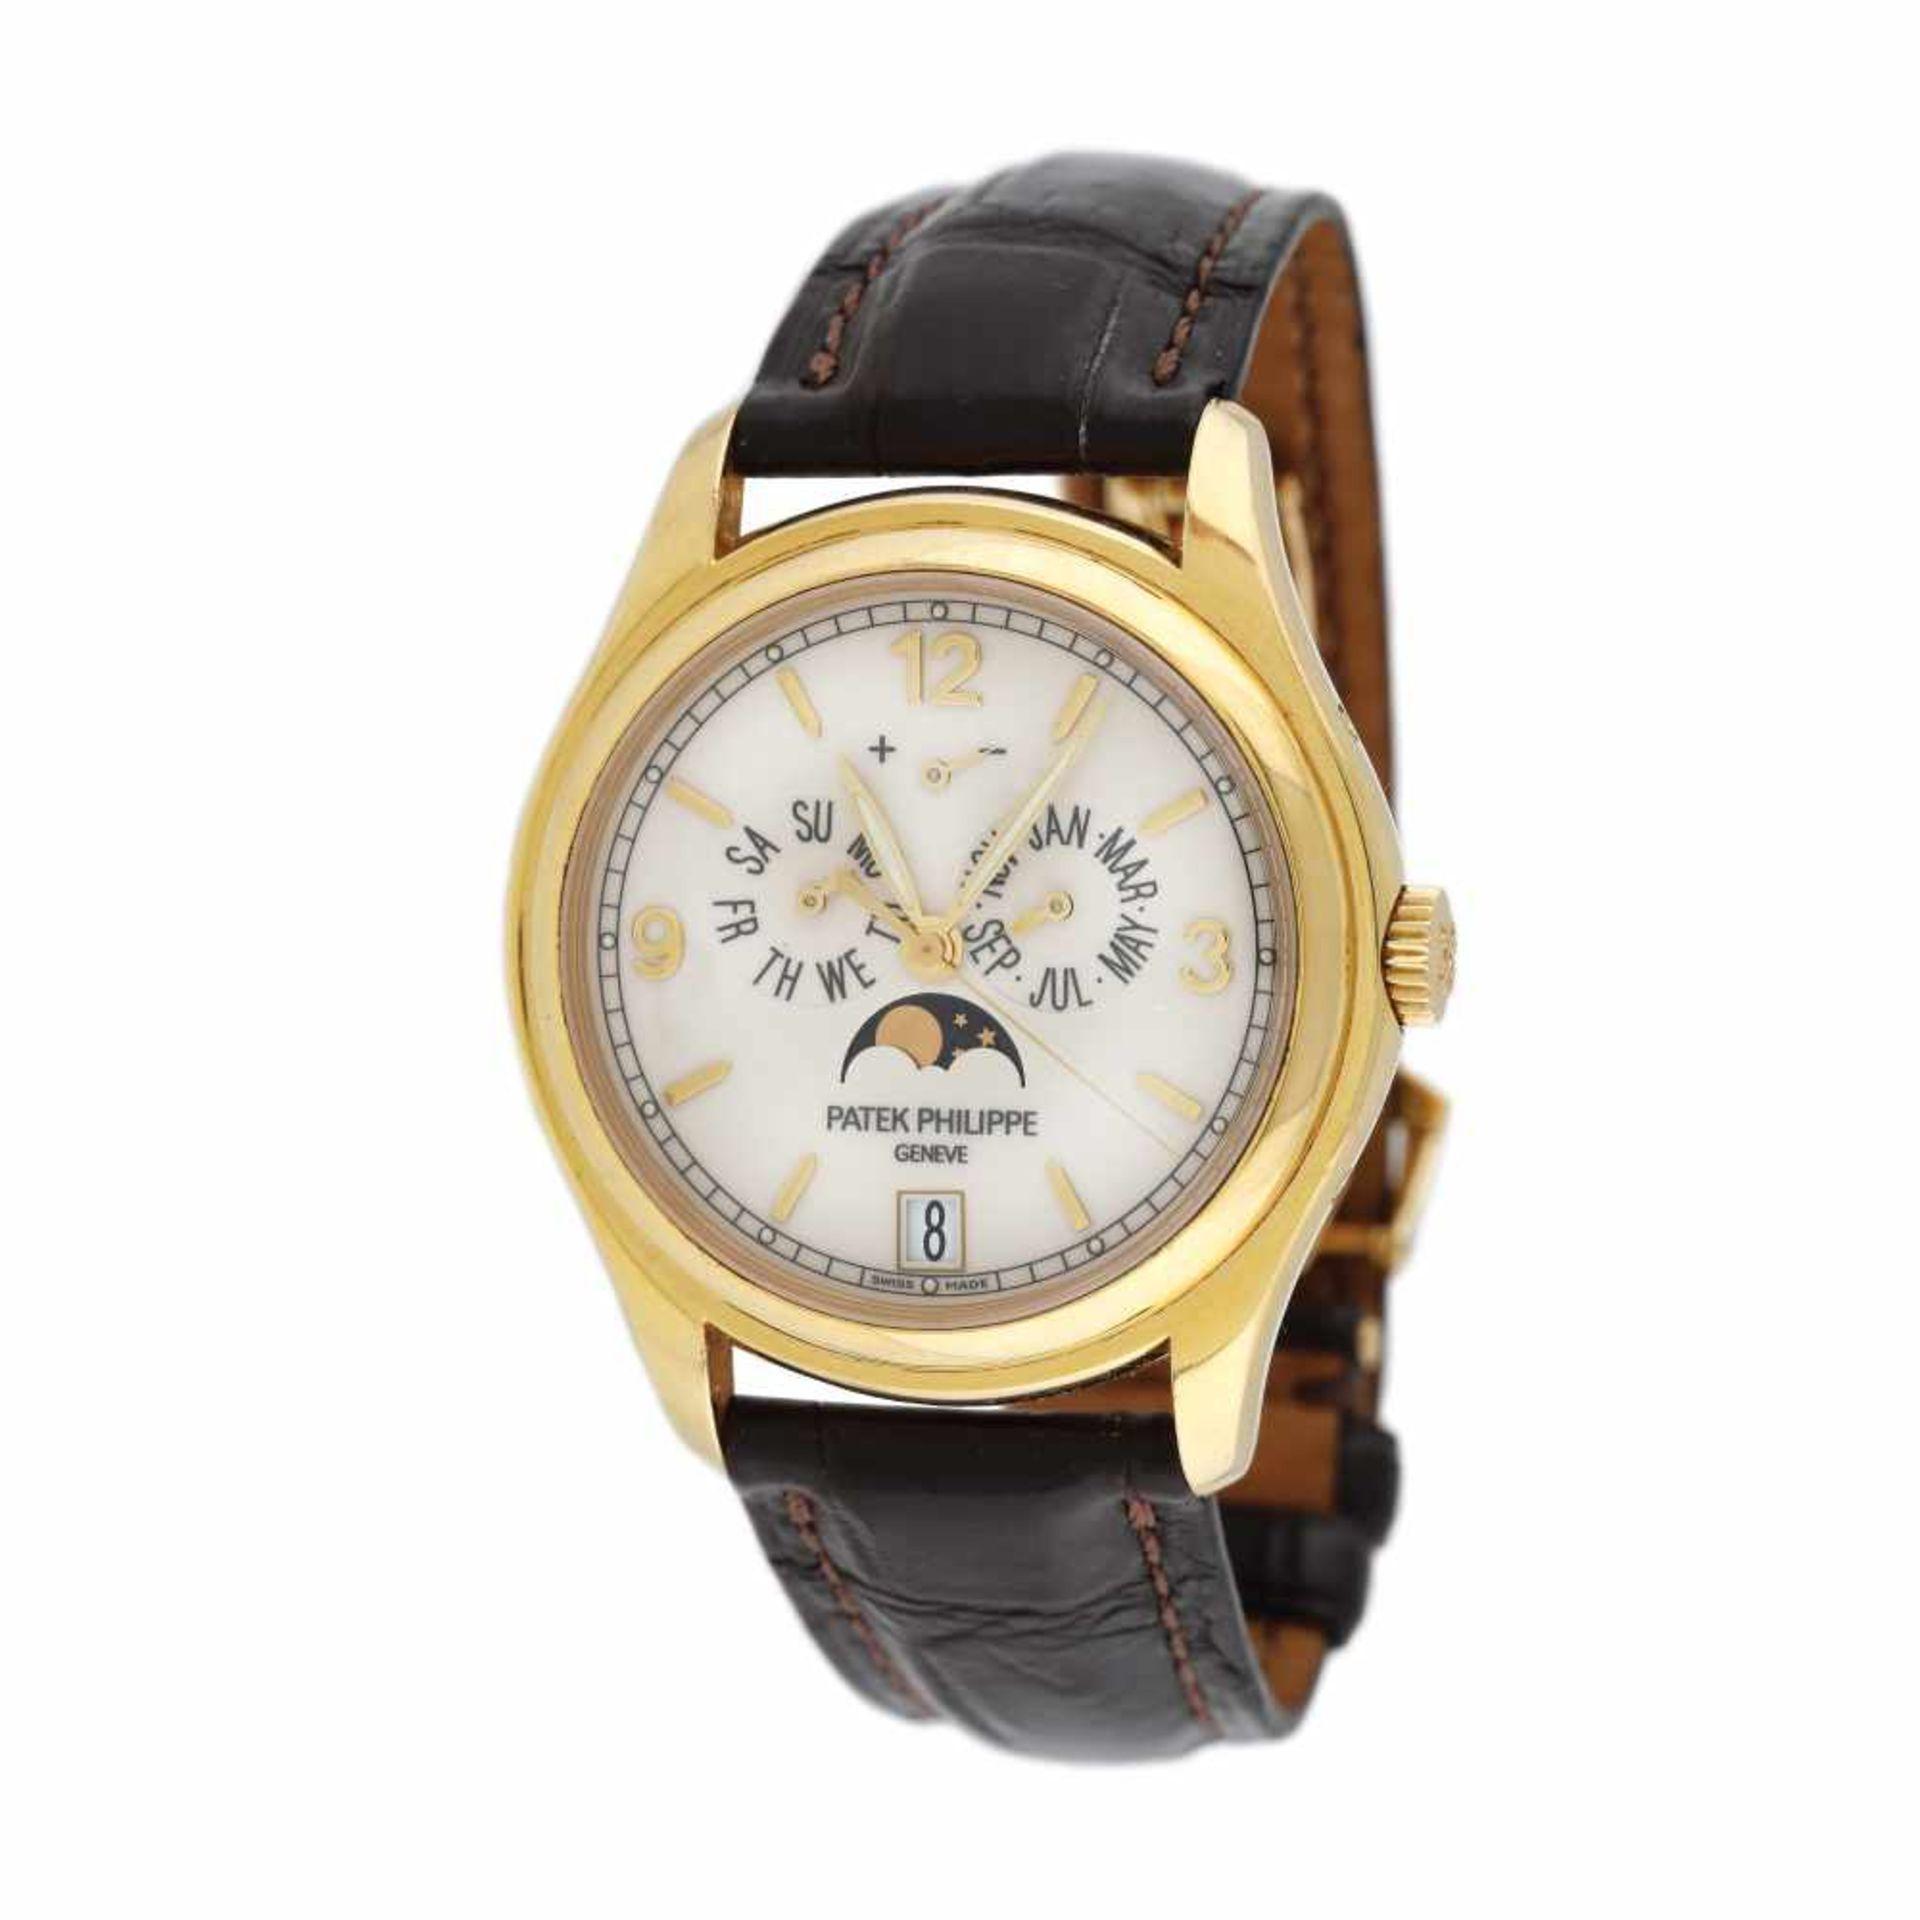 Patek Philippe Annual Calendar Moon Phase wristwatch, gold, men, provenance documents and original b